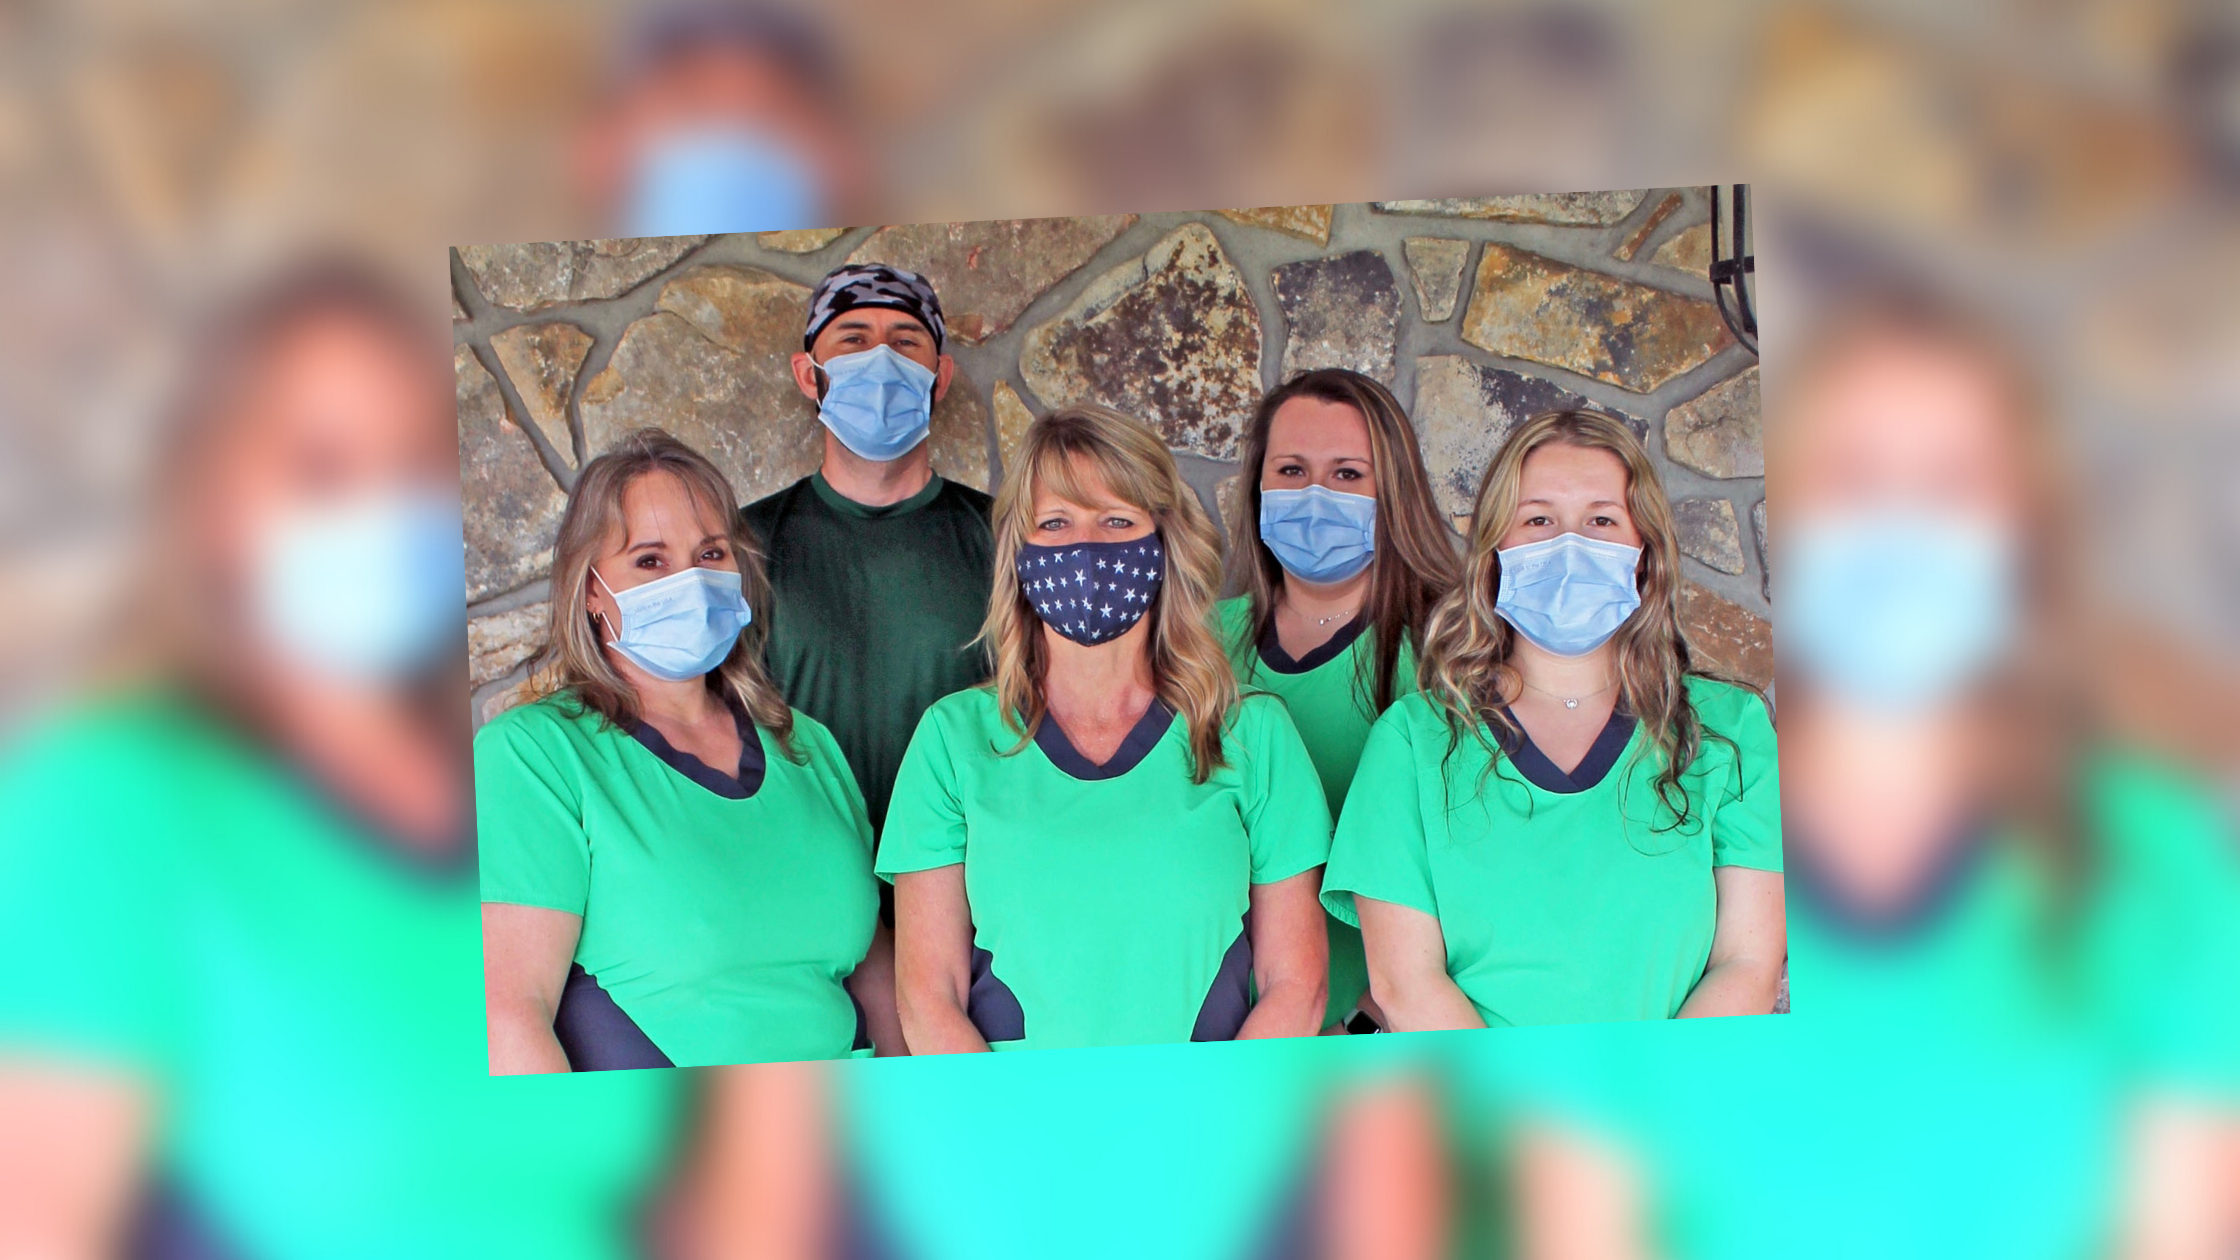 Mental Health Awareness Month #TeamTuesday #MentalHealthMay2021 – Garrett County Dental Health Unit – +3 Prize Points